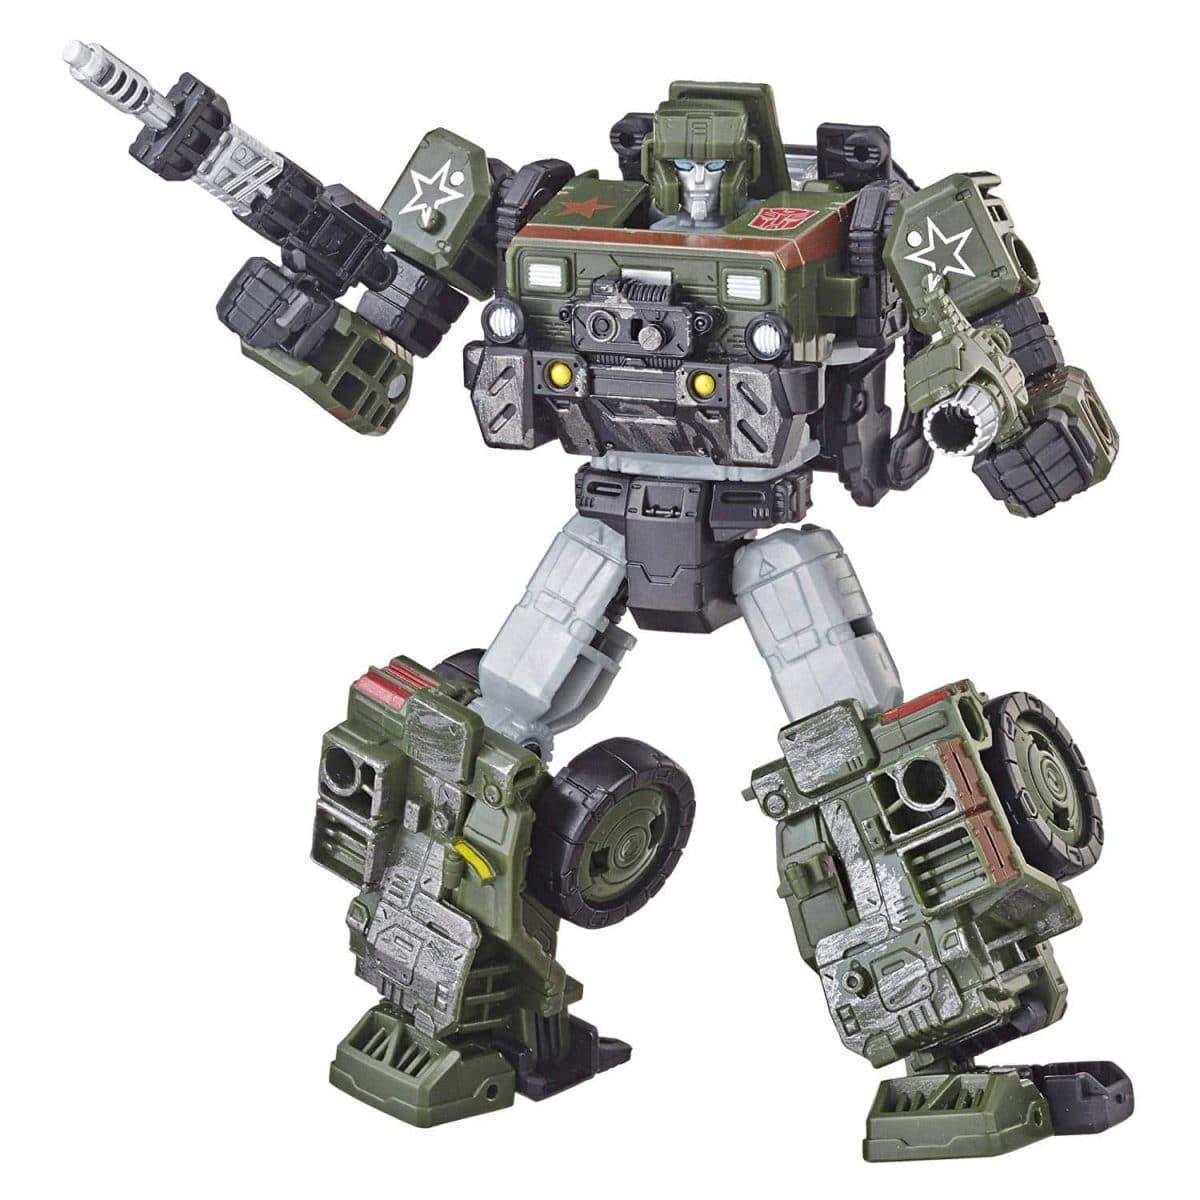 E3537 Wfc-S9 Autobot Hound Action Figure